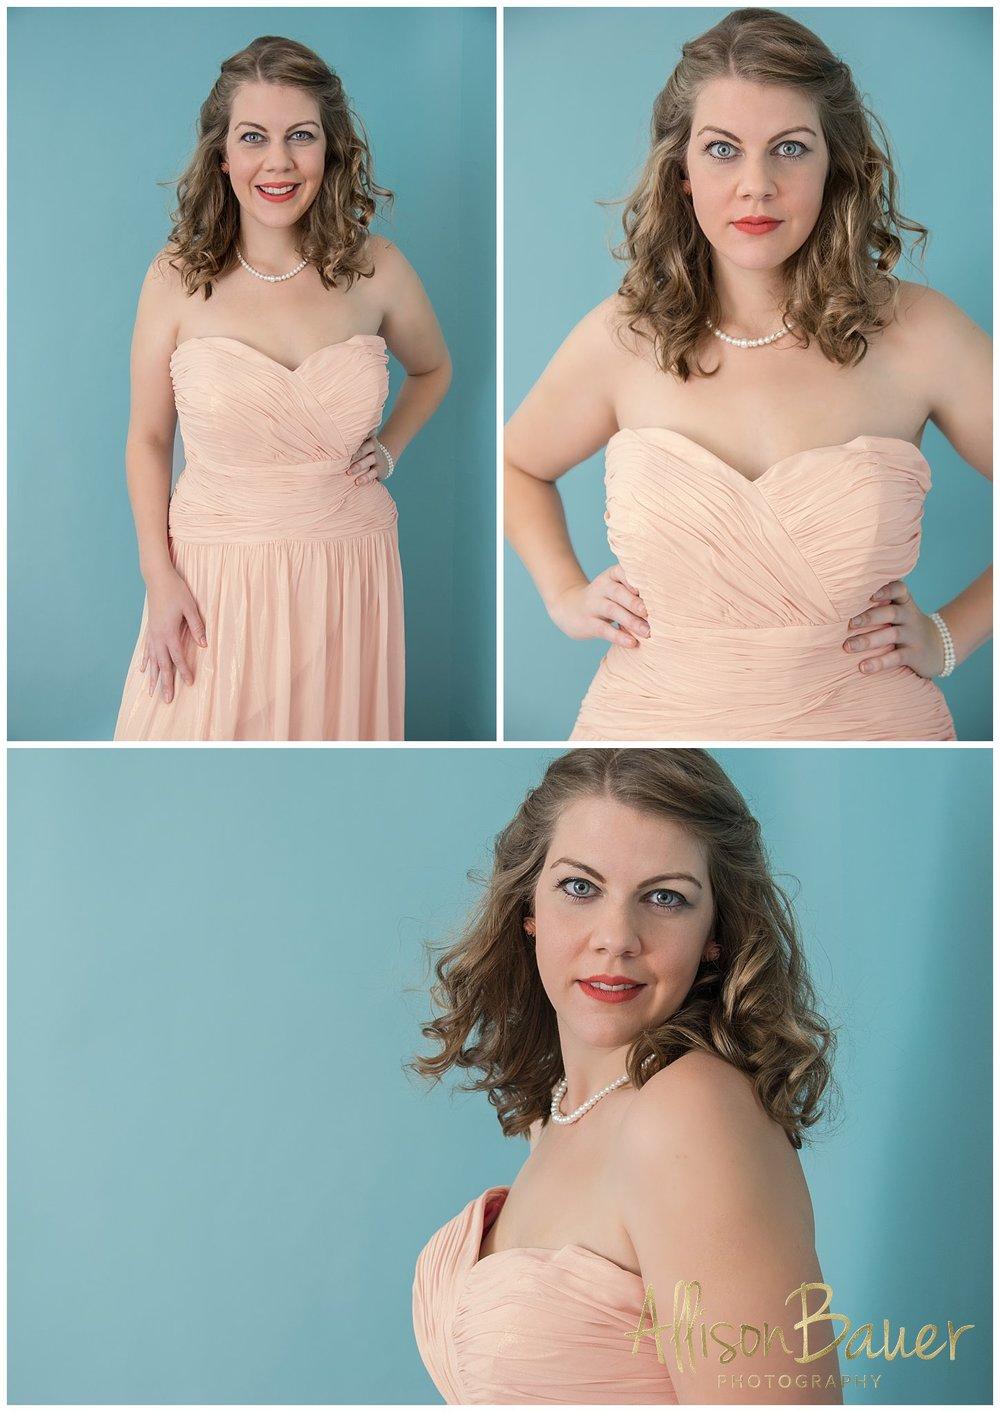 Allison-Bauer-Rosenheim-Fotostudio